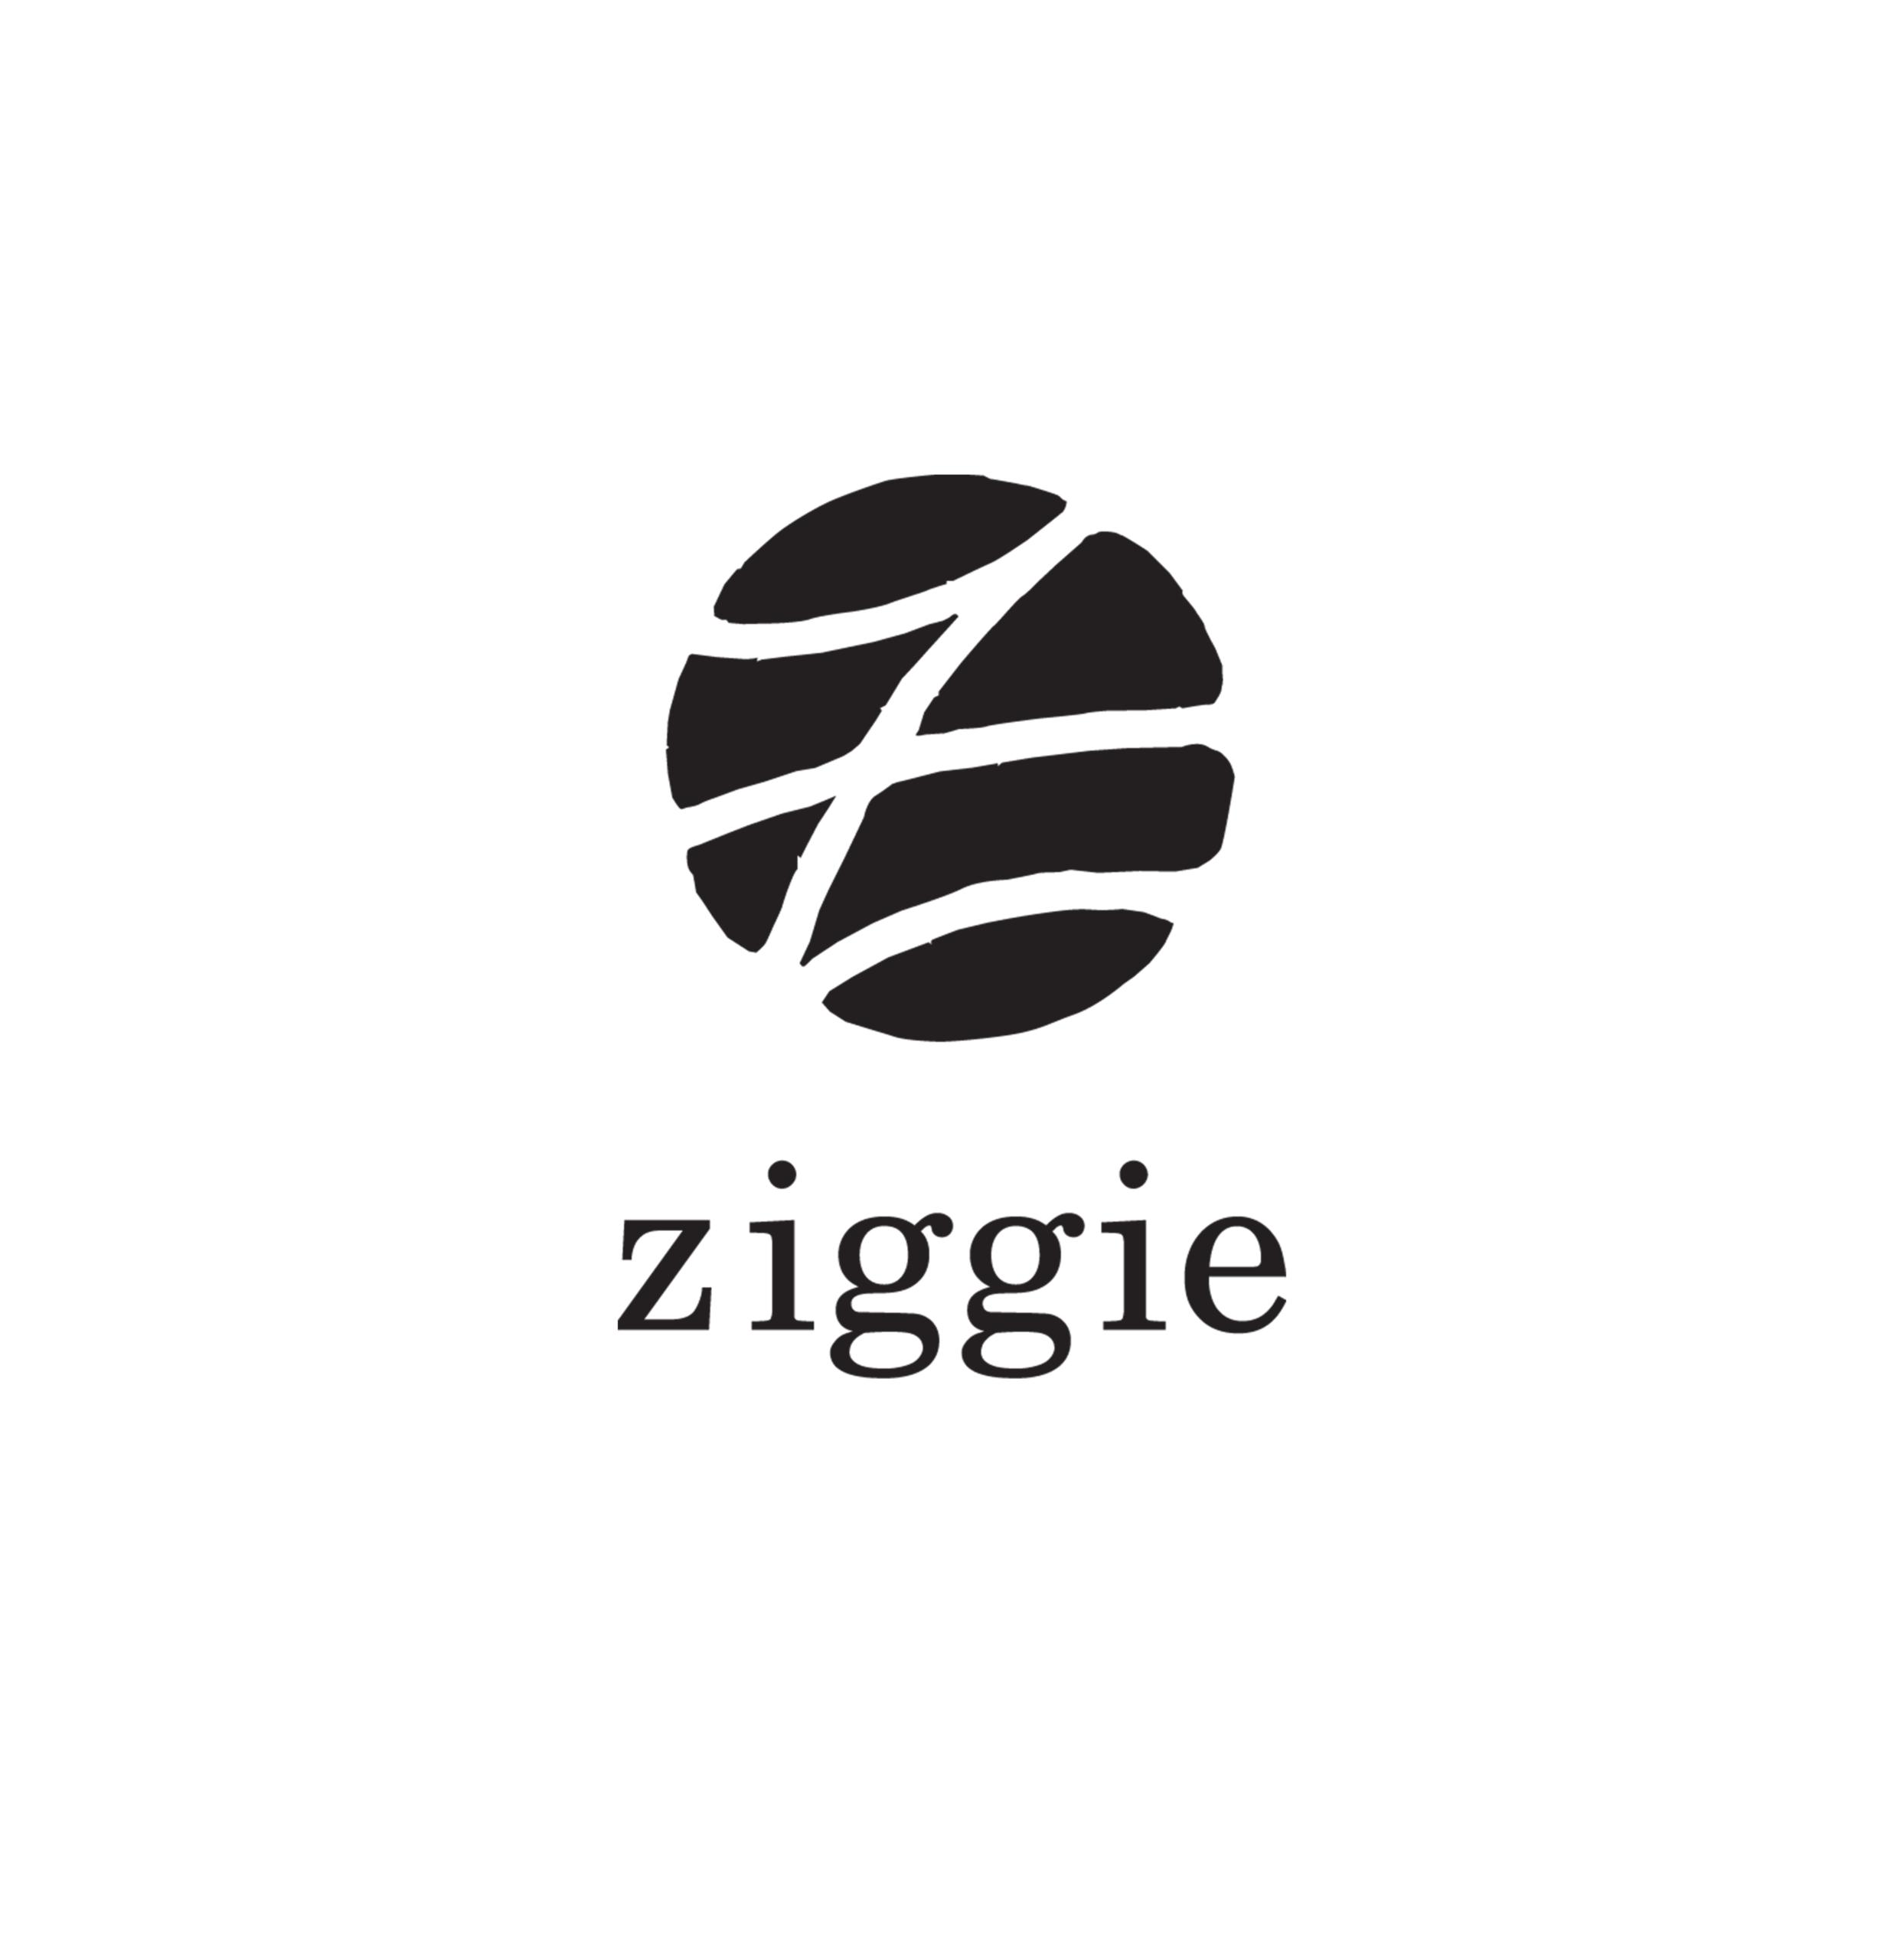 https://bschelling.com/wp-content/uploads/2017/04/ziggie_bk-scaled.jpg